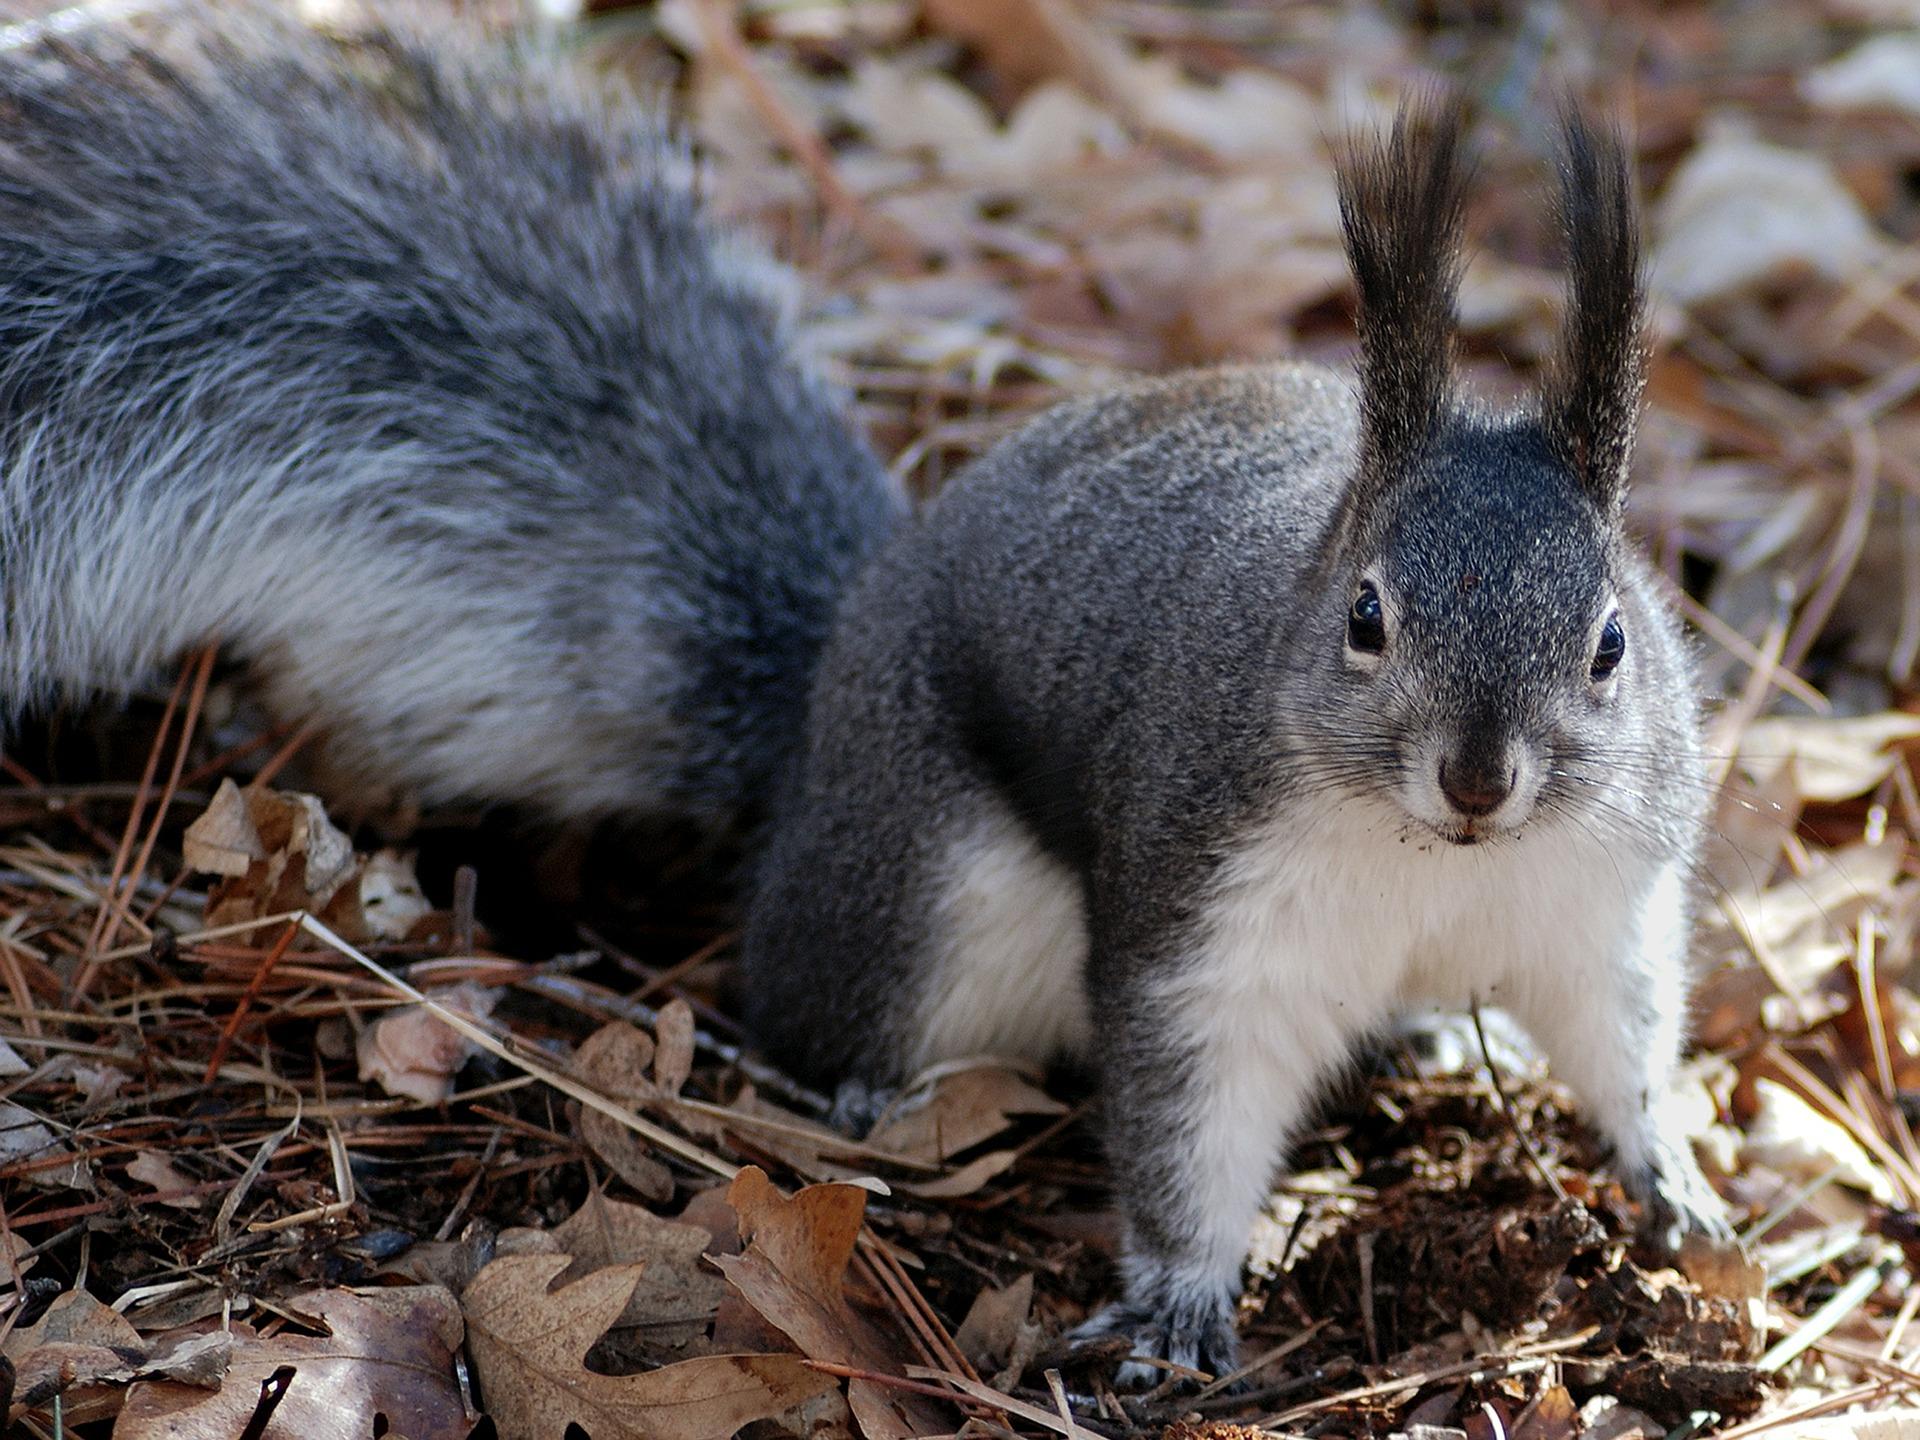 squirrel-80575_1920.jpg